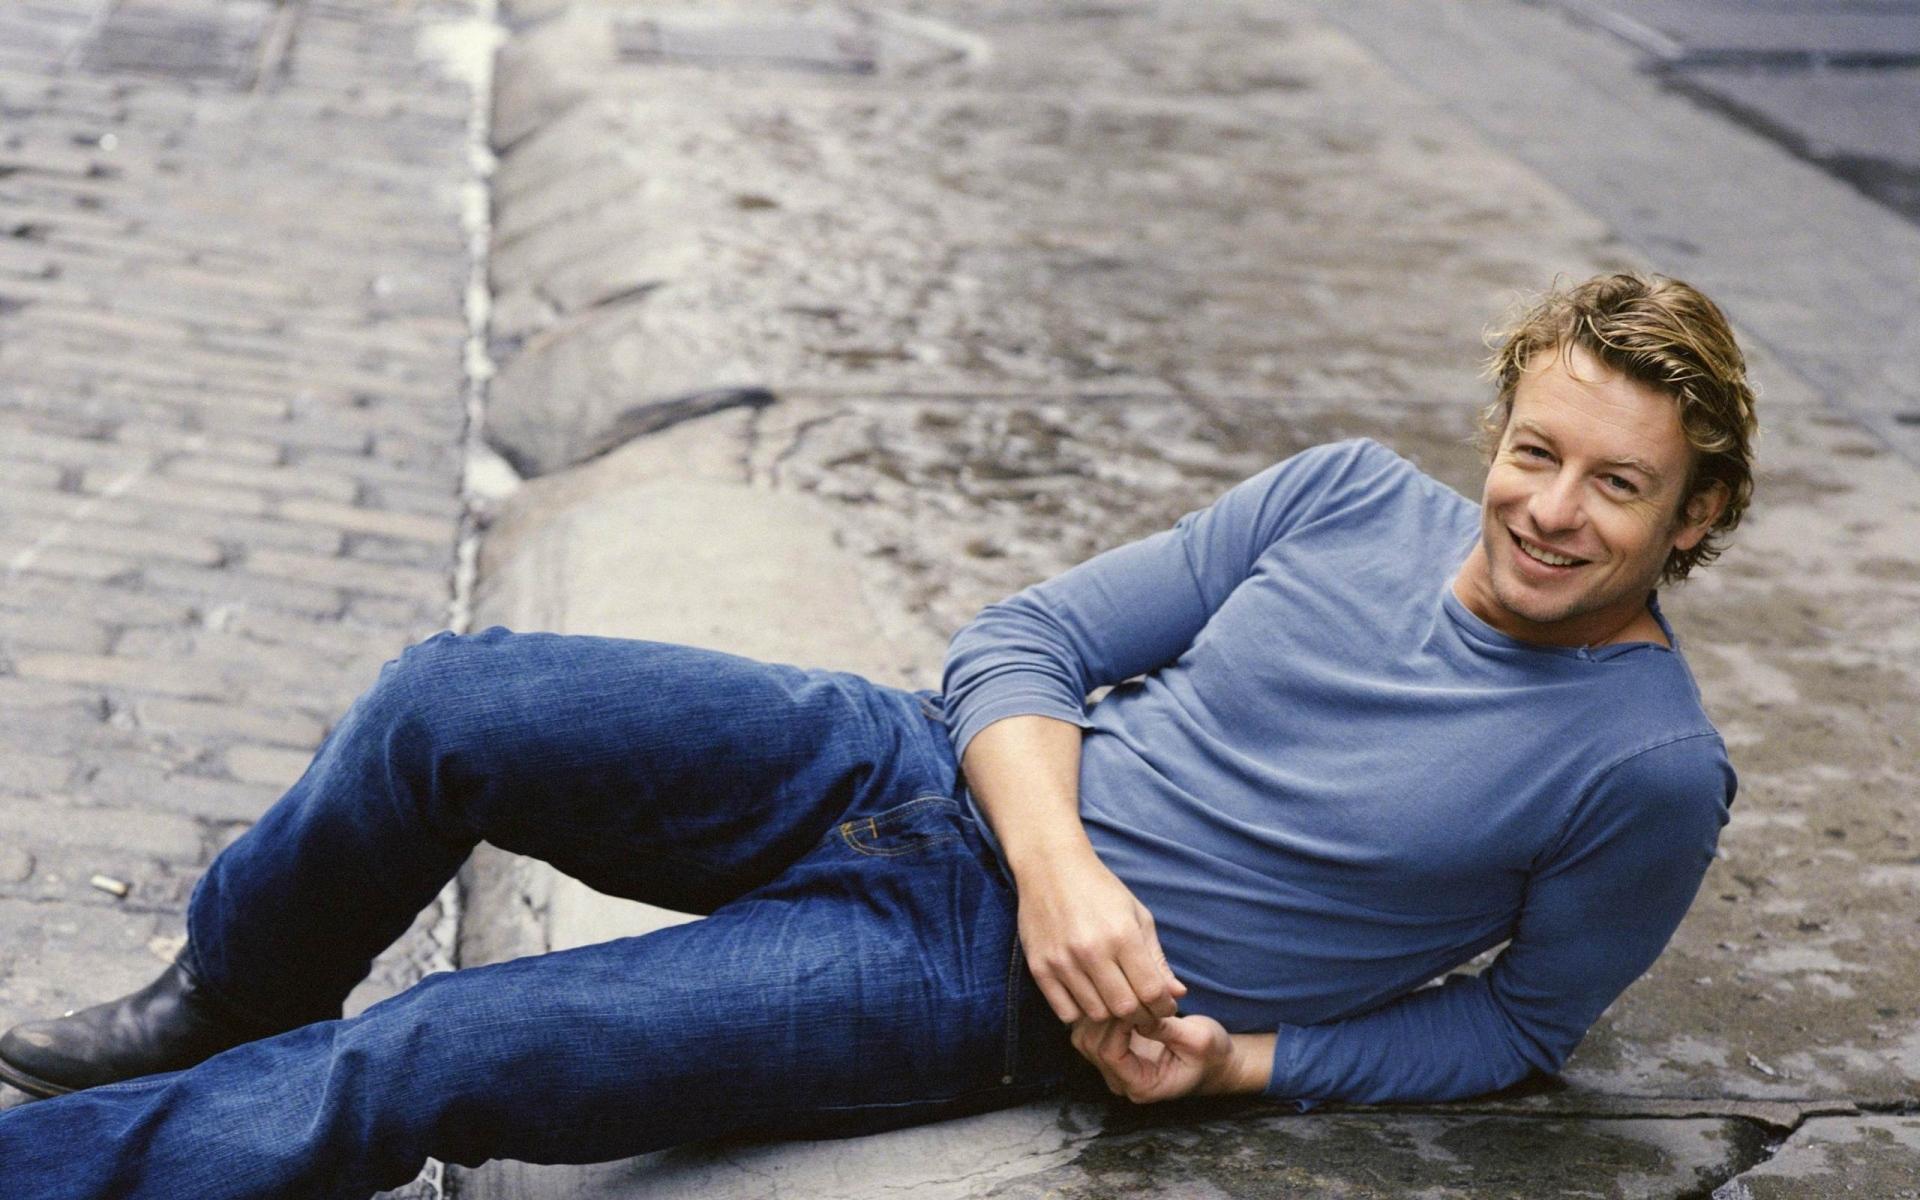 Картинки Симон Бейкер, актер, человек, лежа, улица, улыбка фото и обои на рабочий стол